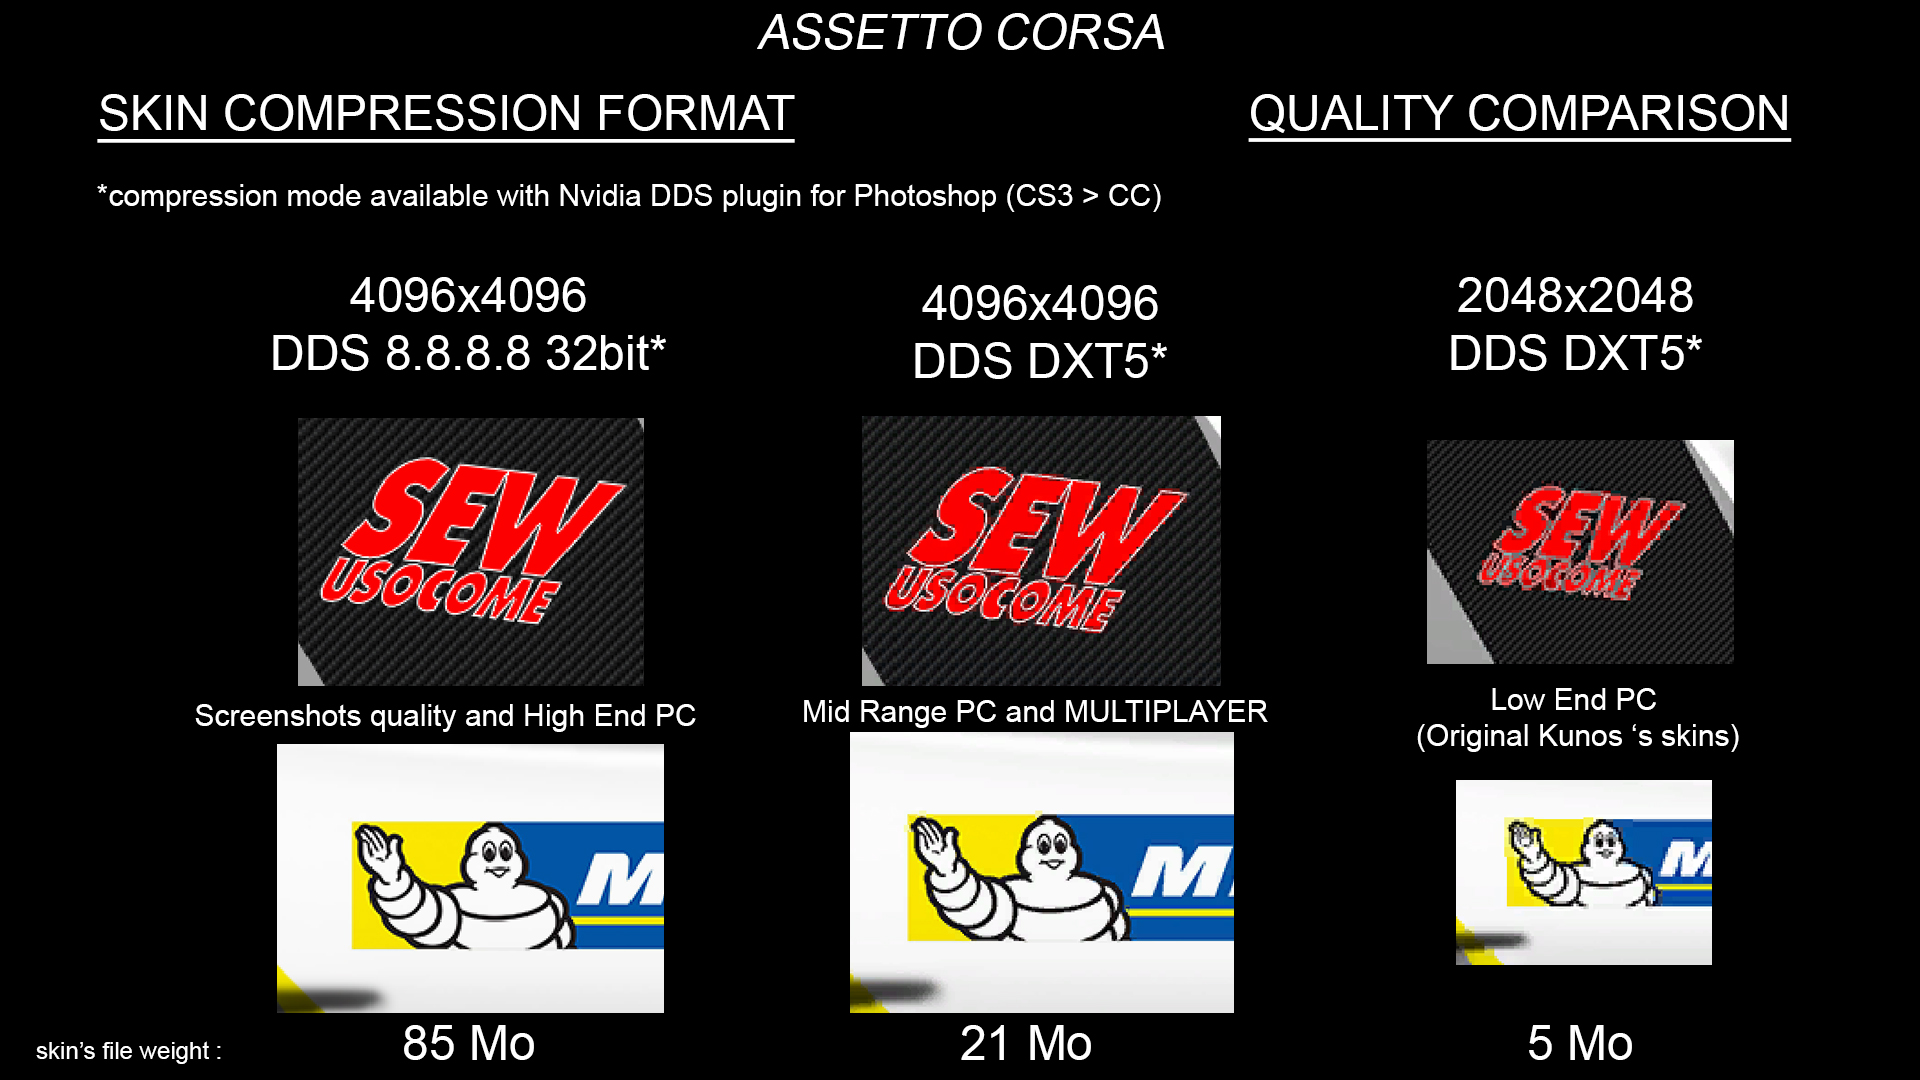 DDS_quality_compar_LQ.jpg